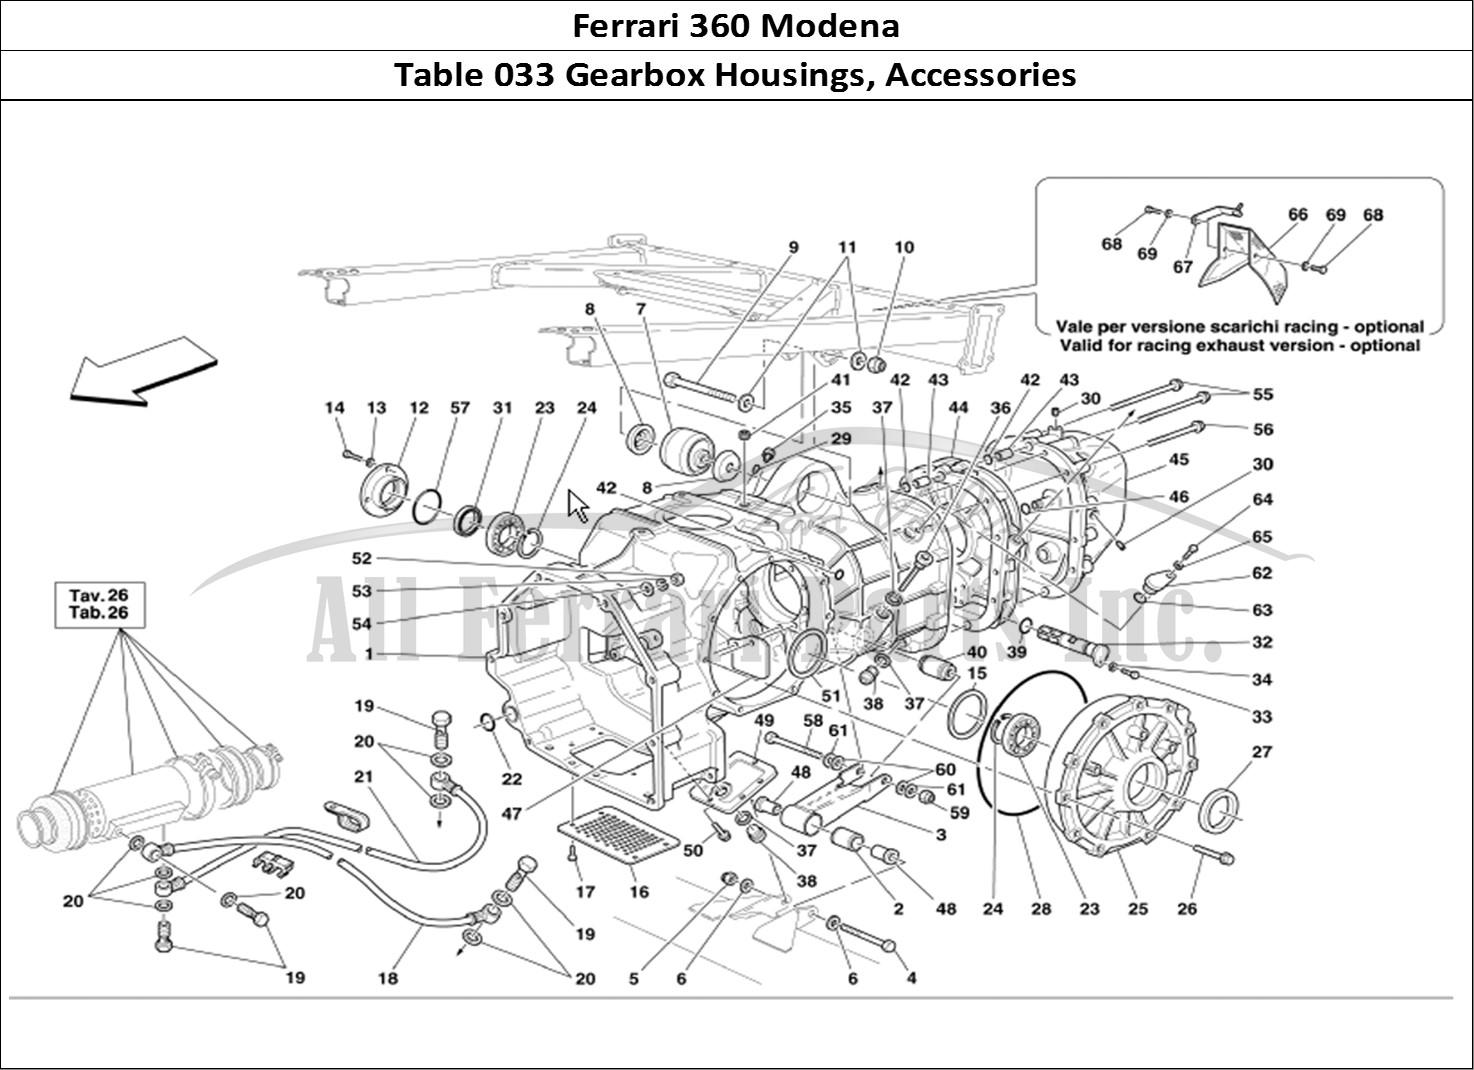 Buy original Ferrari 360 Modena 033 Gearbox Housings